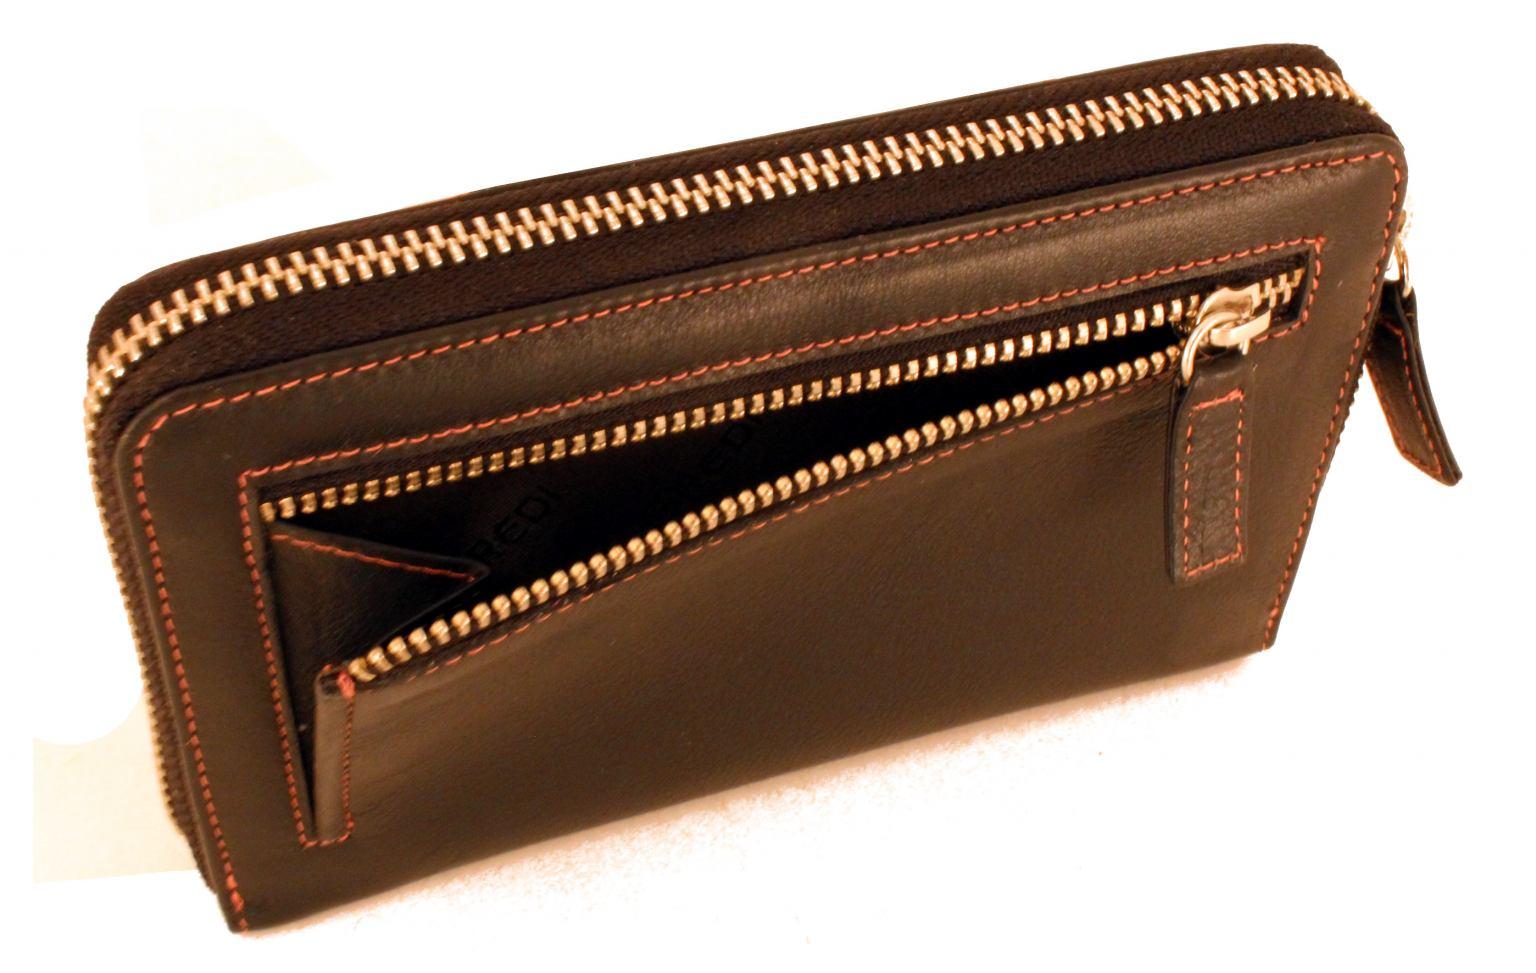 L.Credi Geldtasche Reißverschluss innen bunt Lila